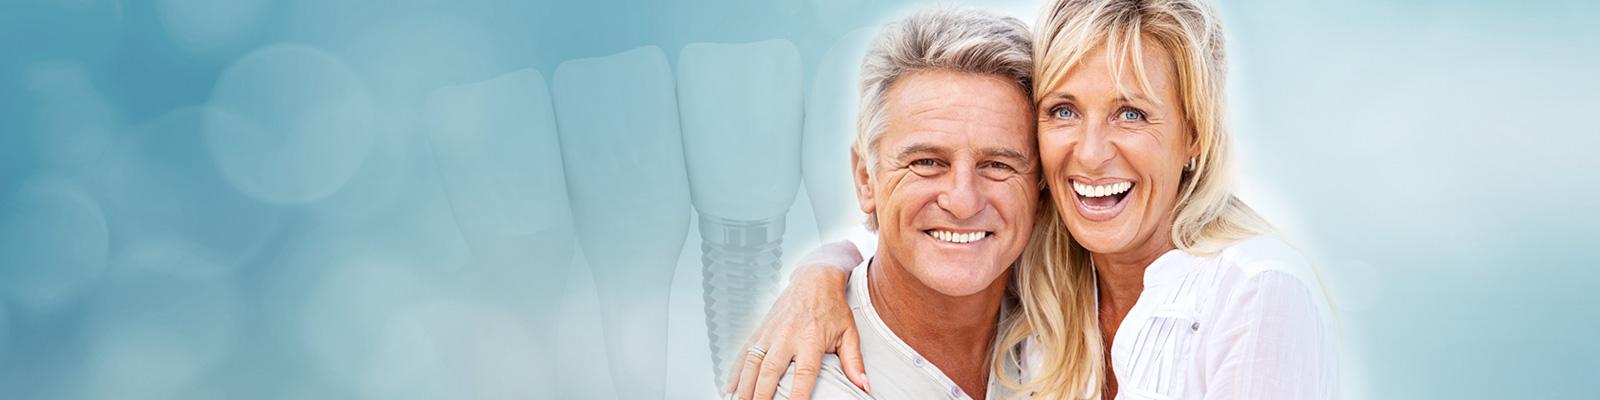 putney-periodontics-home-banner2